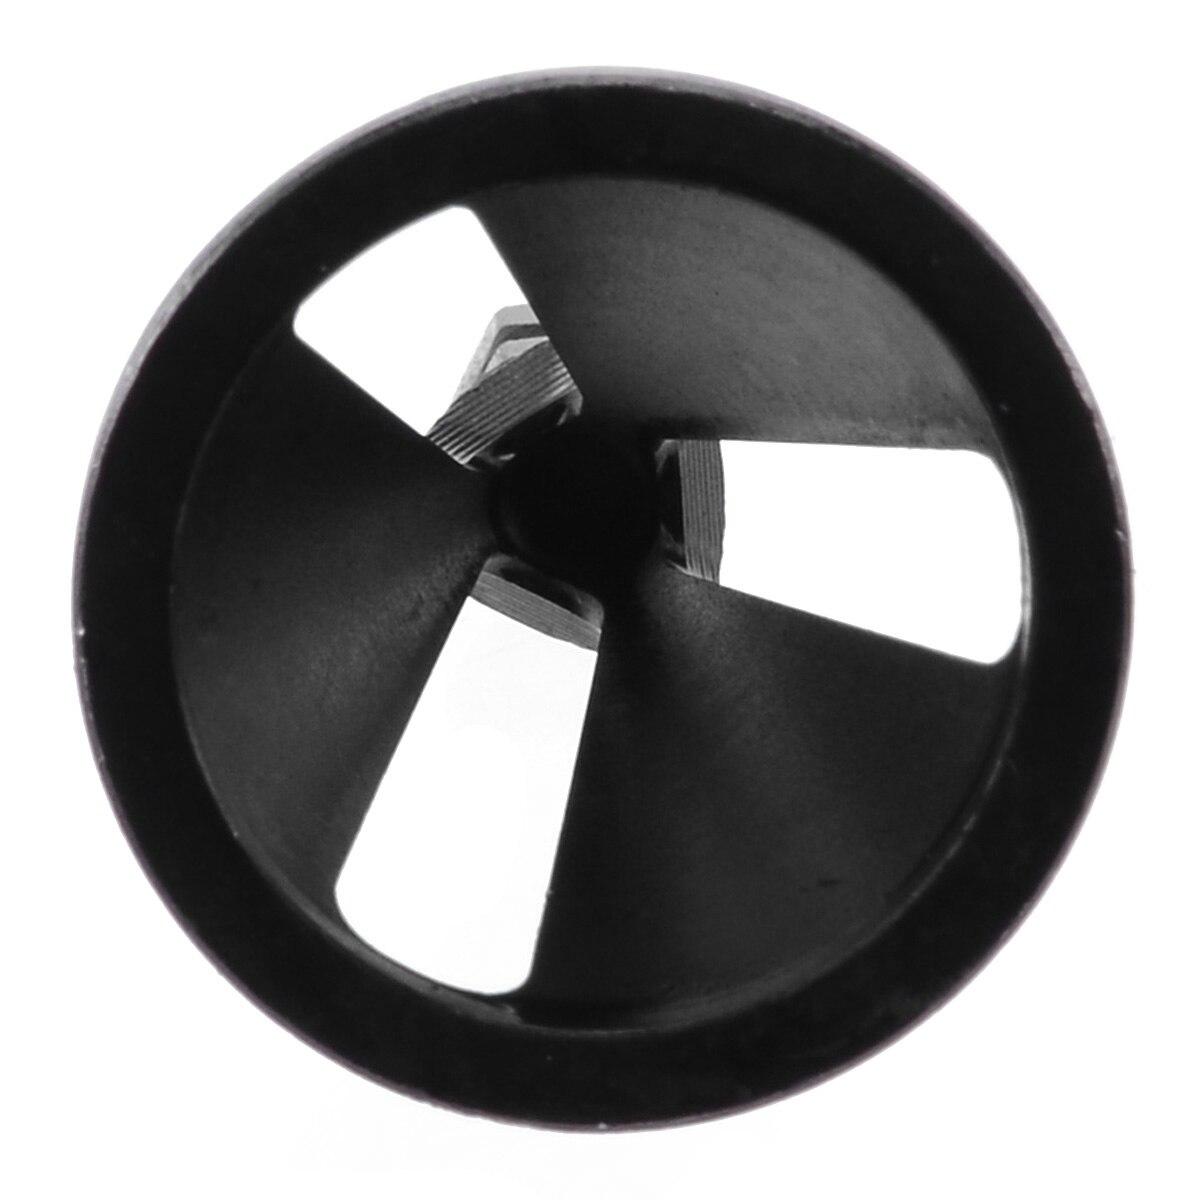 Deburring External Chamfer Tool Black Bit Deburring External Chamfer Steel Remove Cutting Burr Drill Tools Mayitr